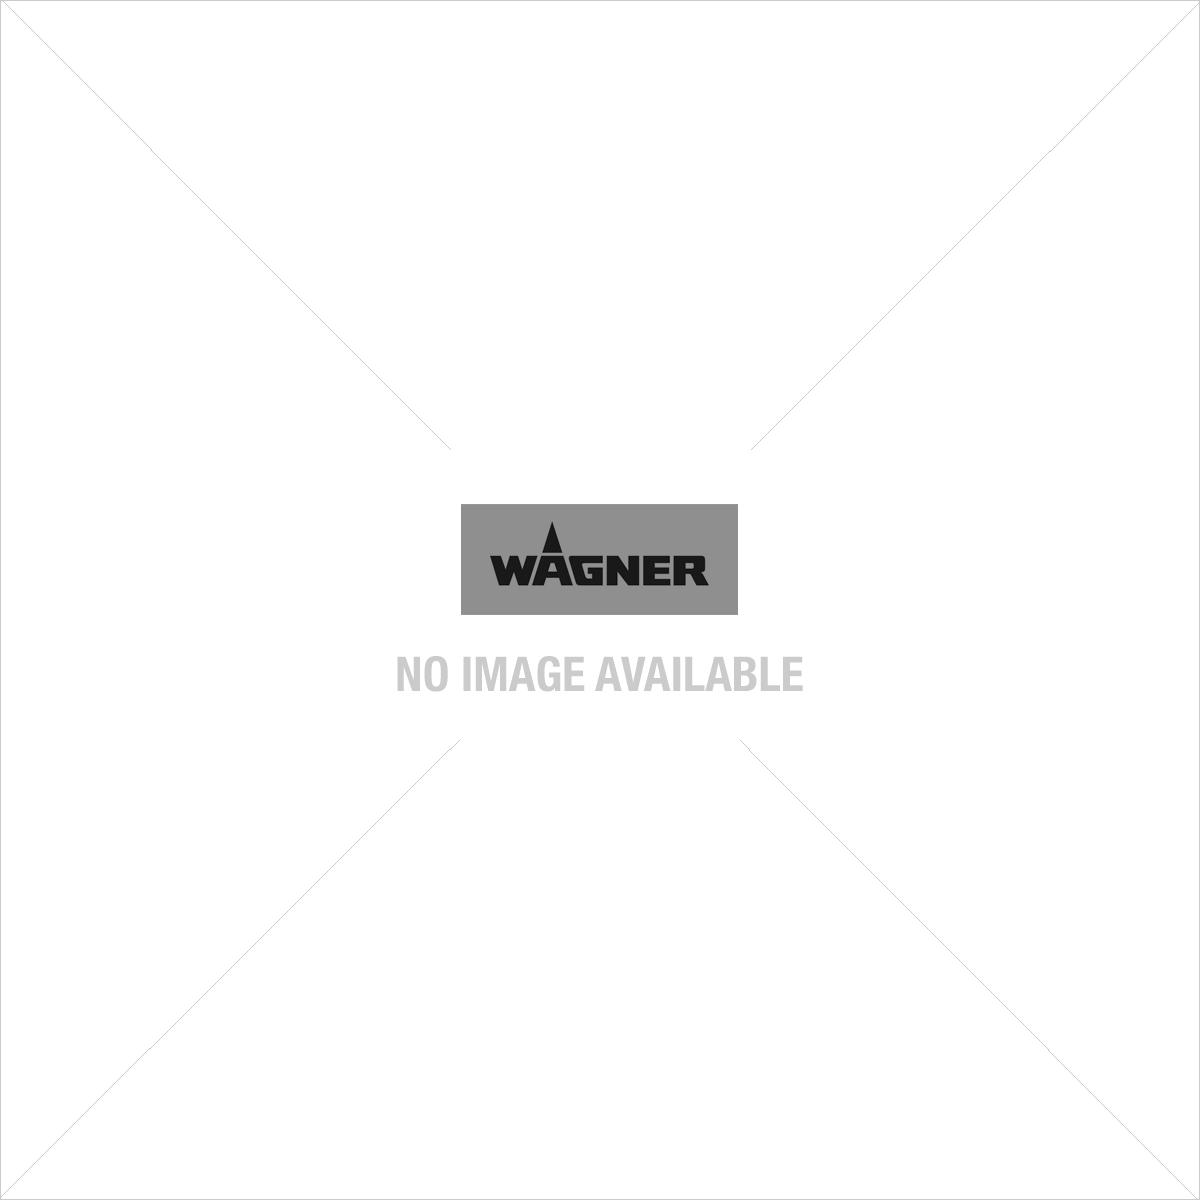 Wandfarbe Weiß - 10 Liter